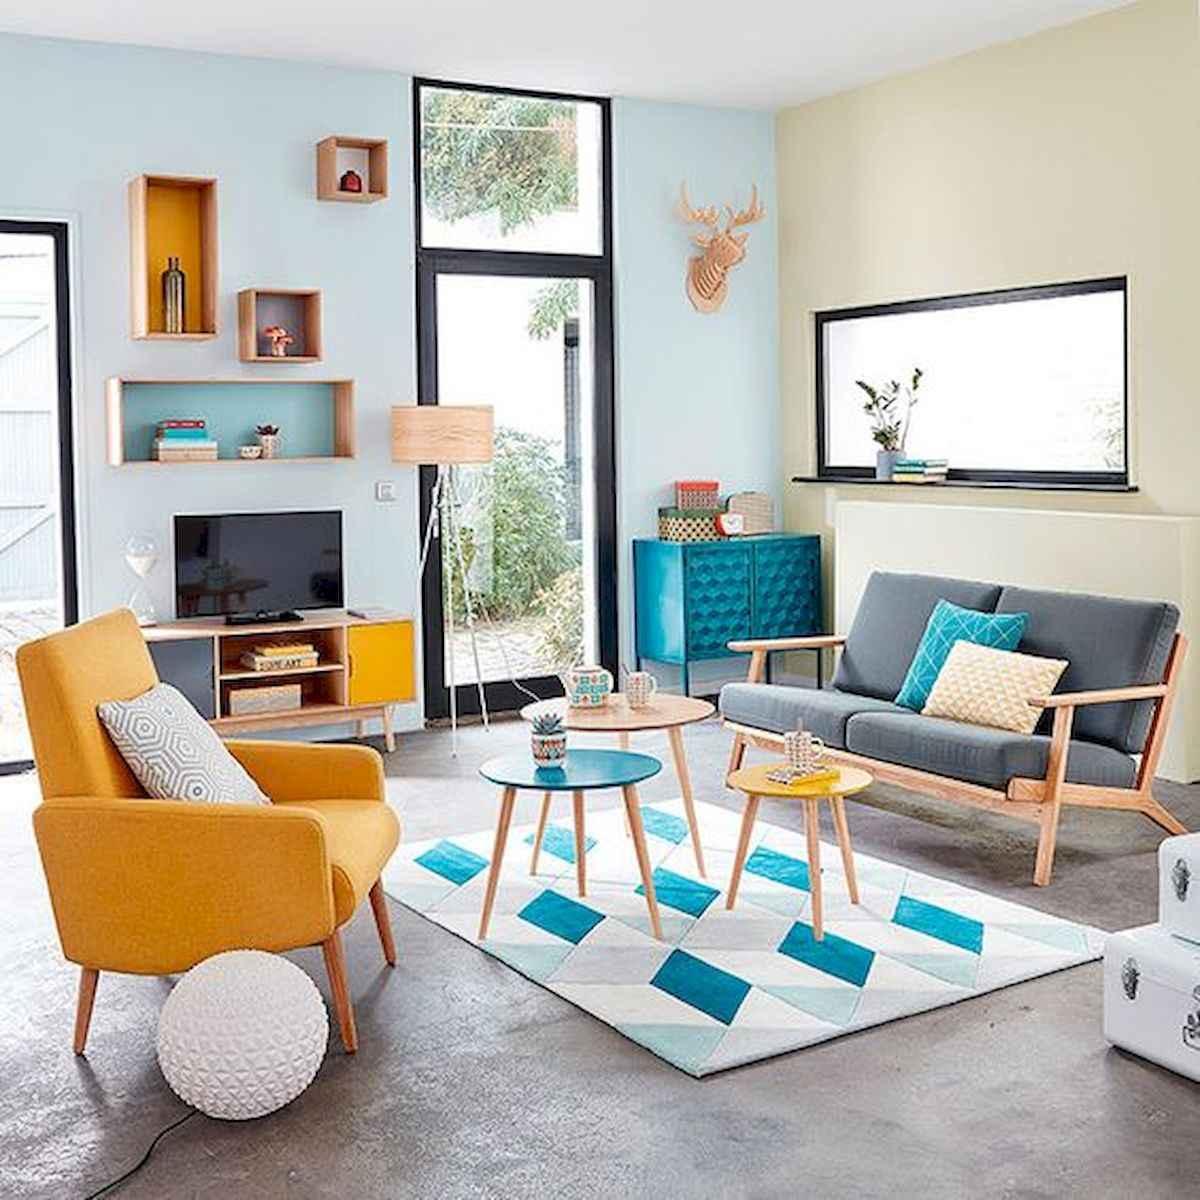 25 home decor ideas for modern living room (27)